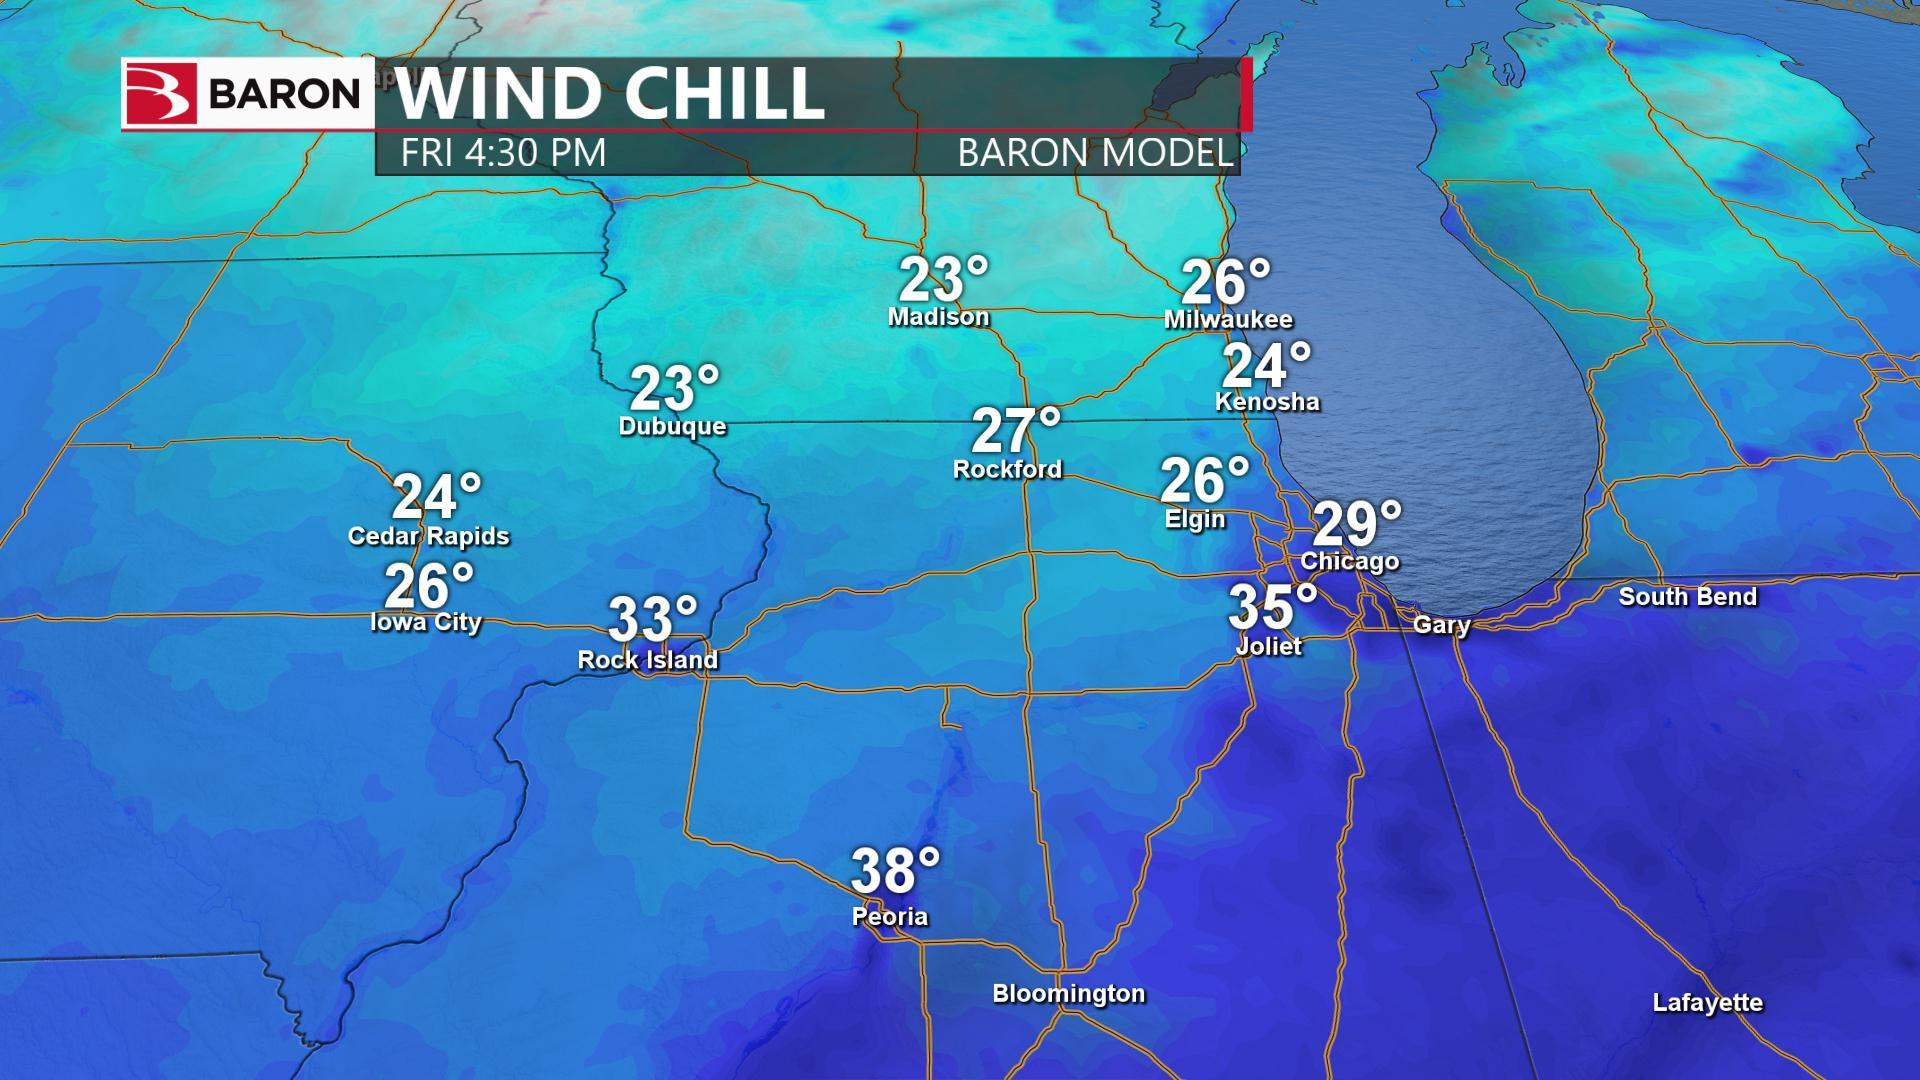 BM Wind Chill